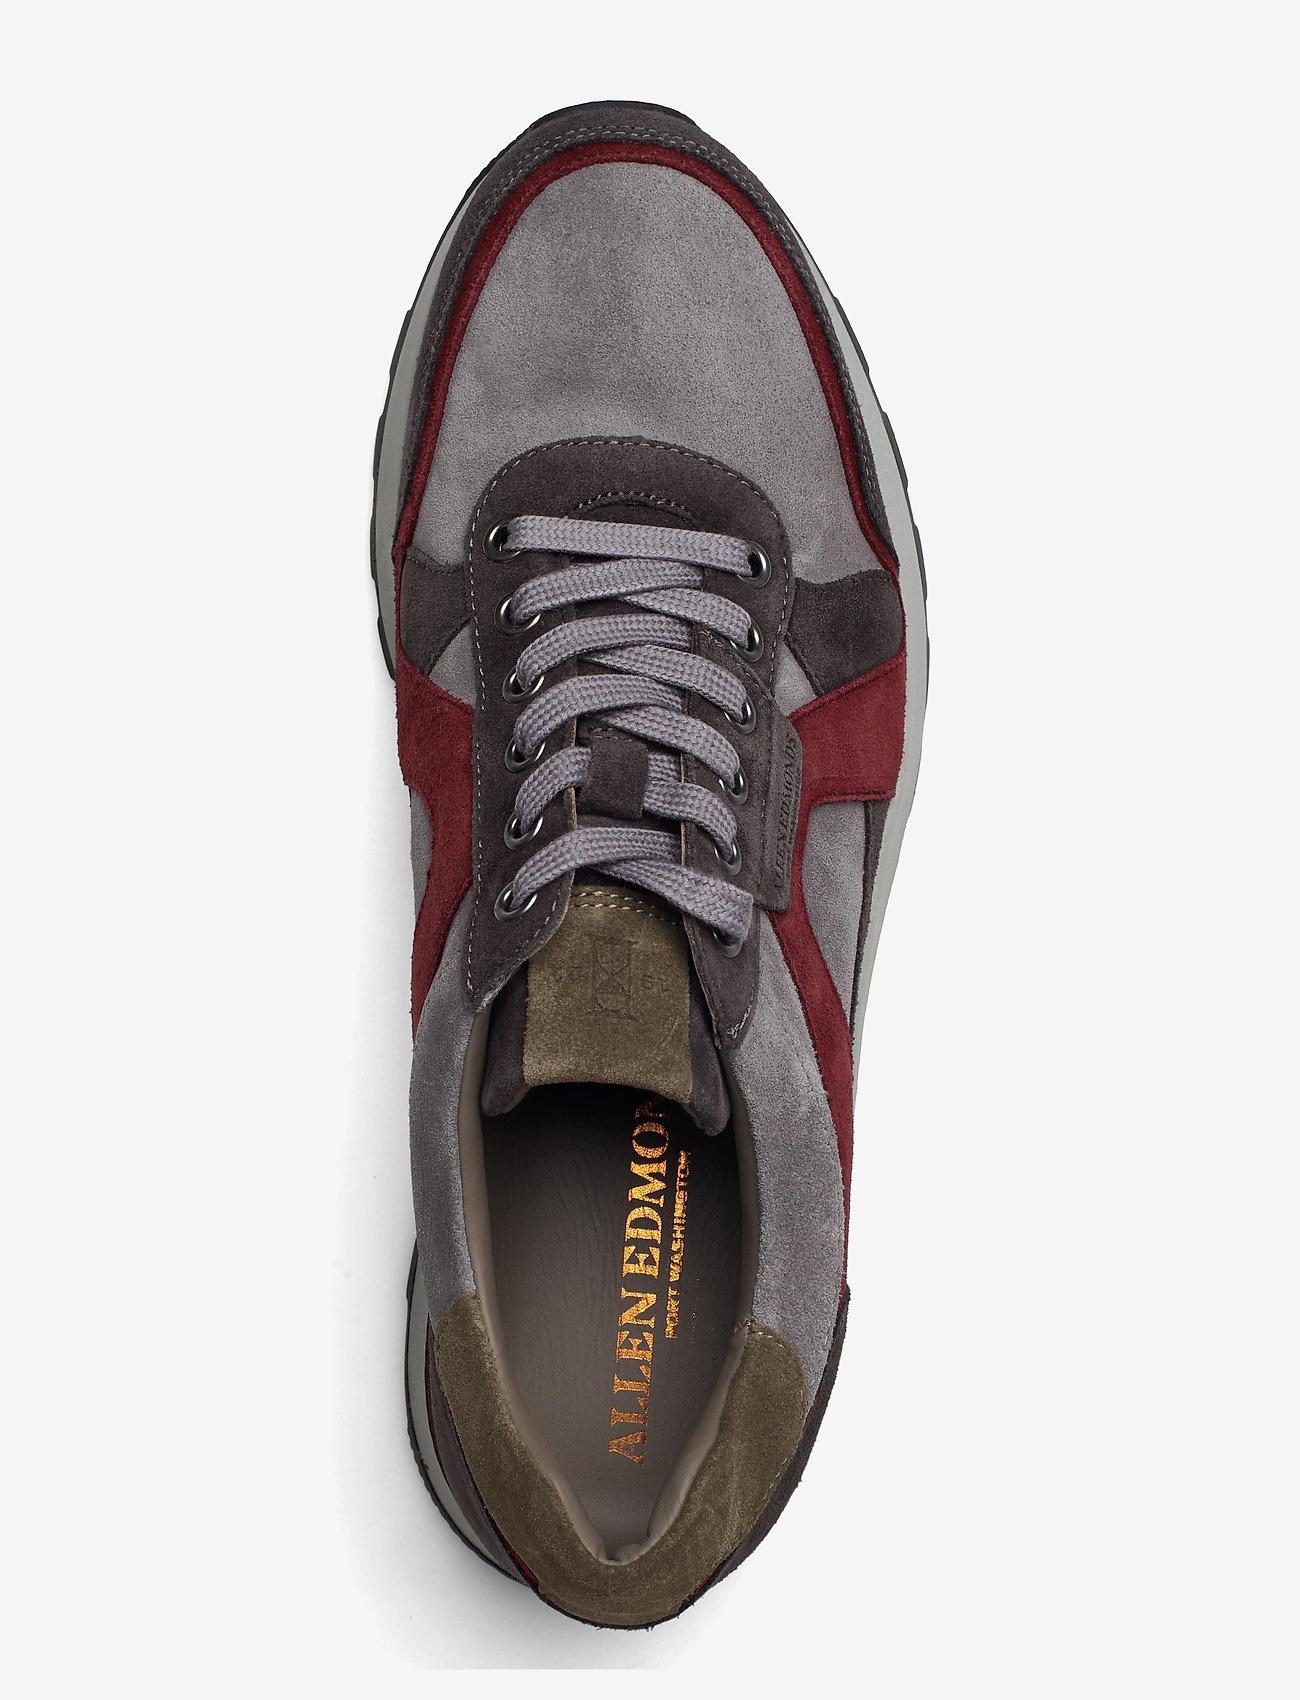 Allen Edmonds - A-Trainer - låga sneakers - grey/burgundy - 3